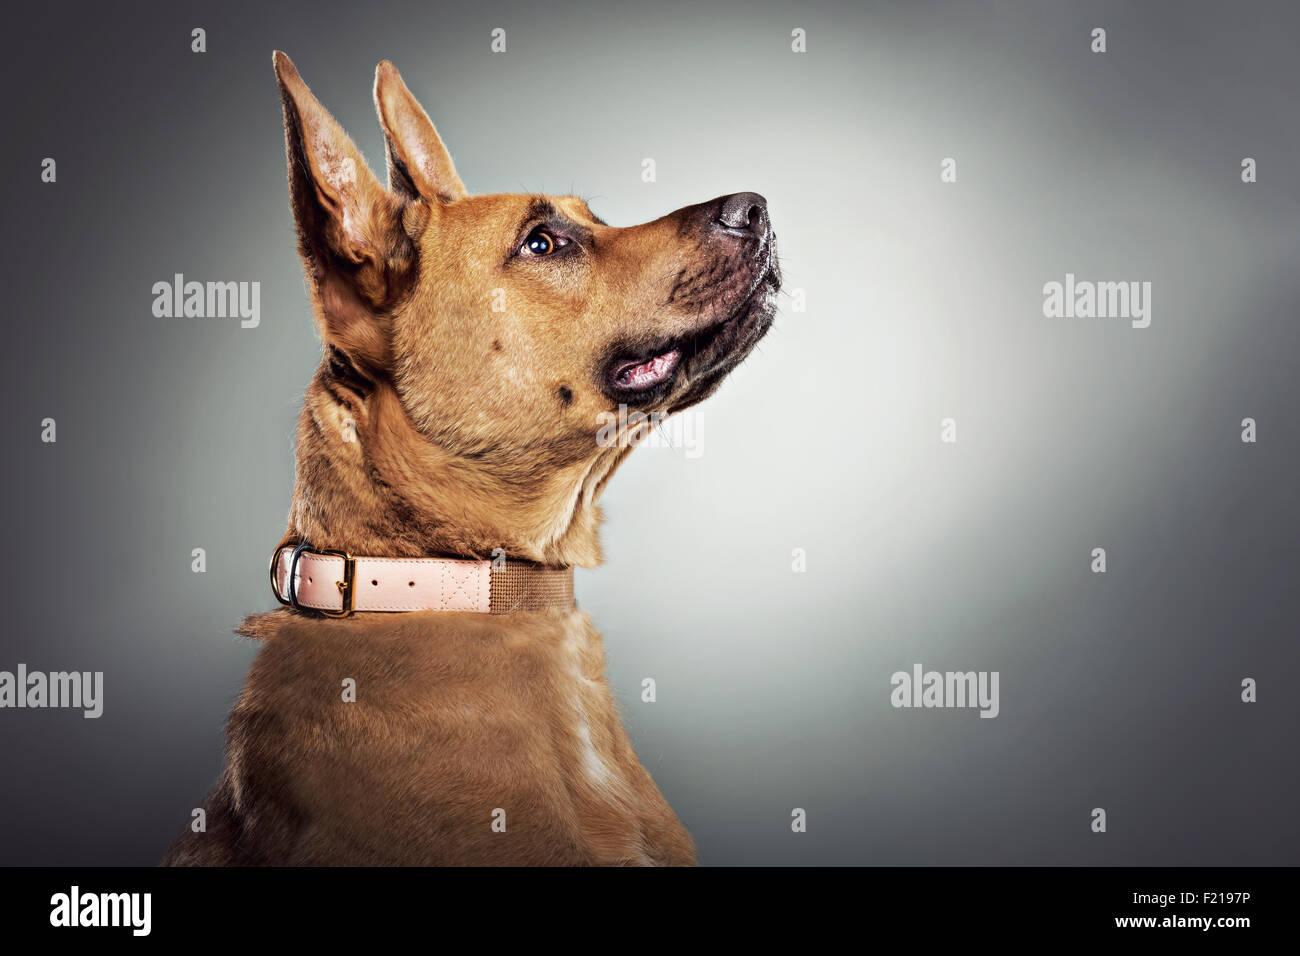 Profile of German shepherd dog in studio. Stock Photo